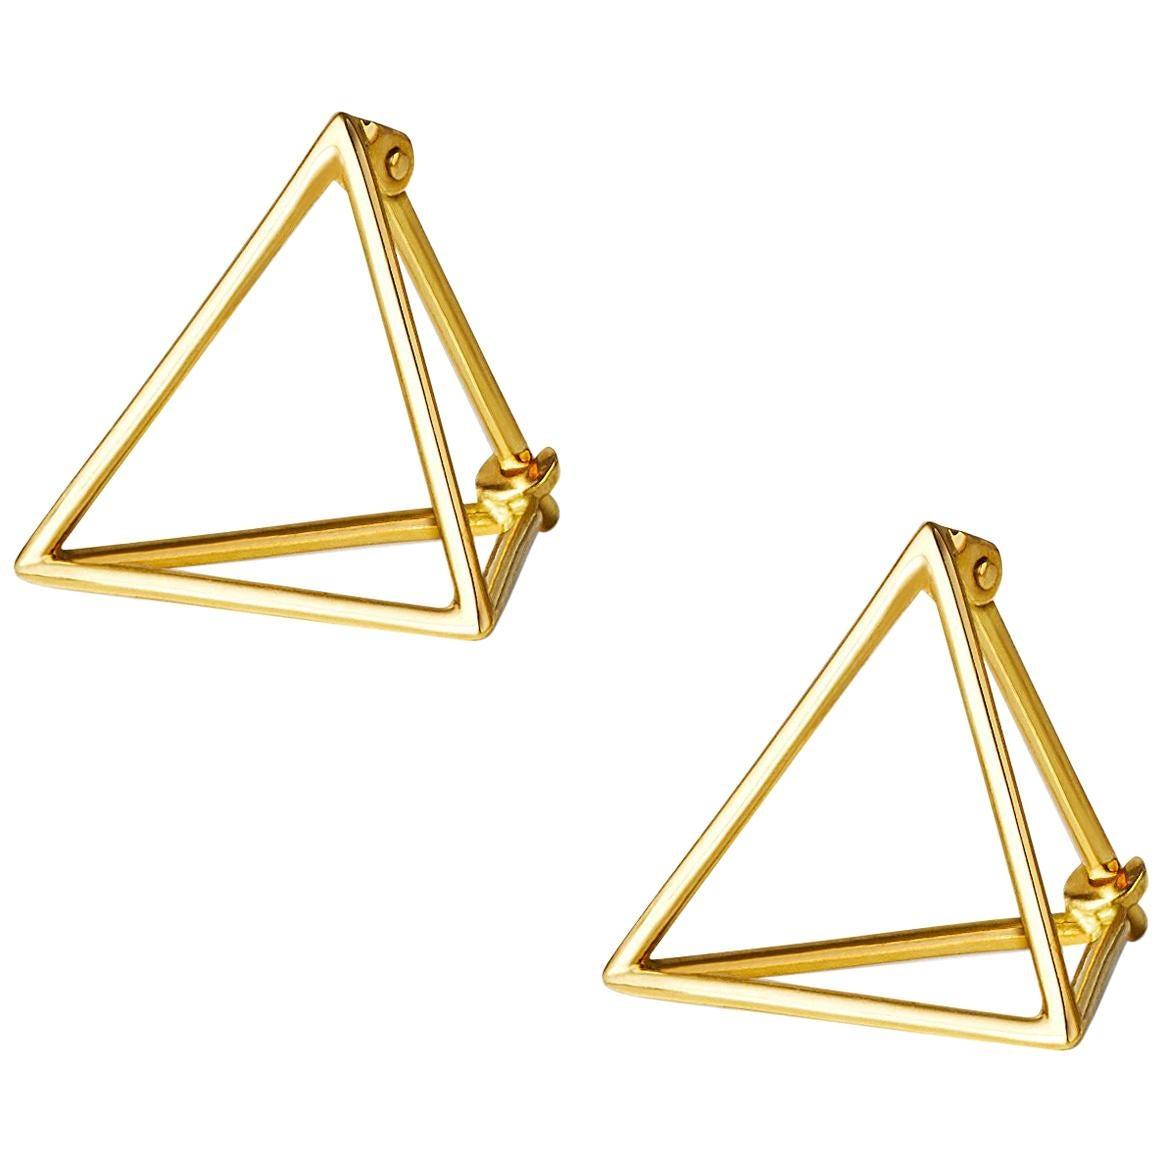 18 Karat Yellow Gold Triangle Pair Earrings